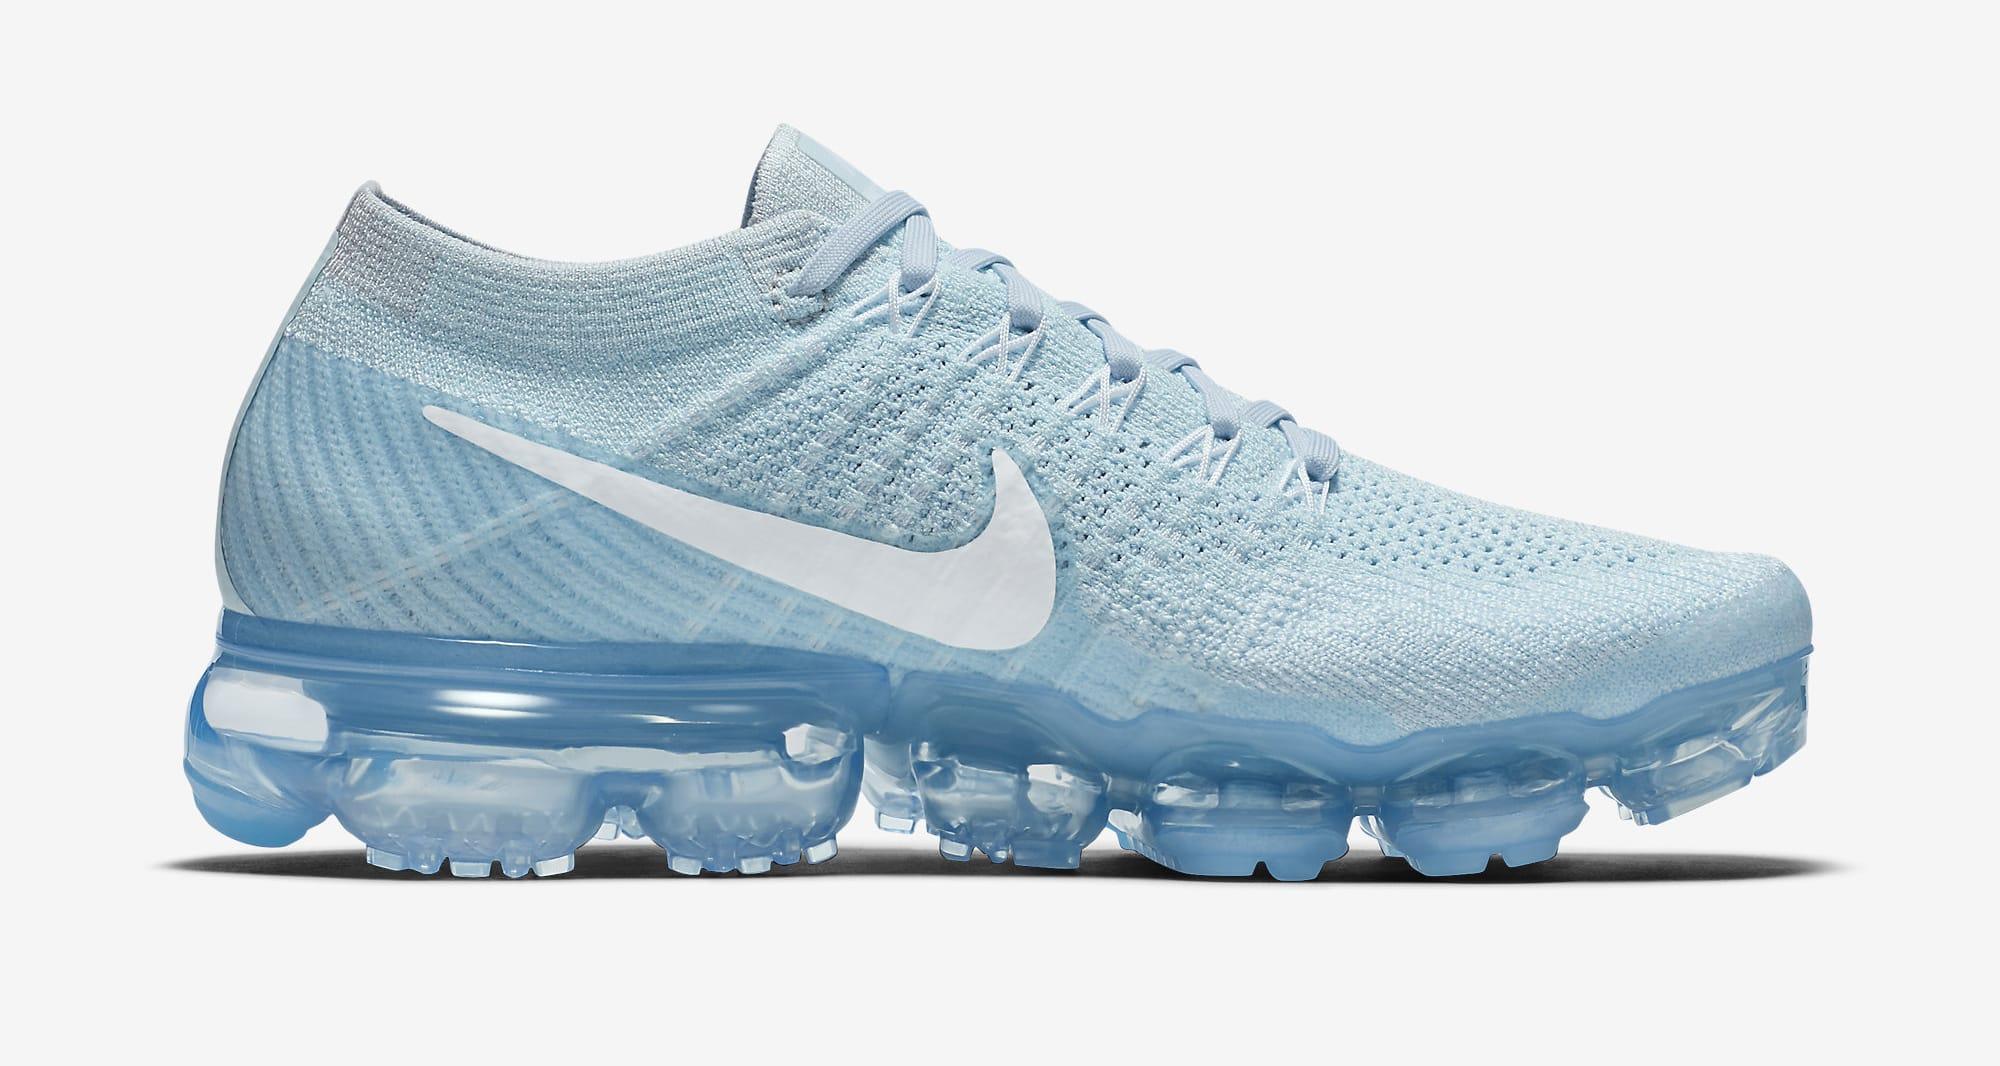 b422de1371 Nike Vapormax Blue Orbit biological-crop-protection.co.uk